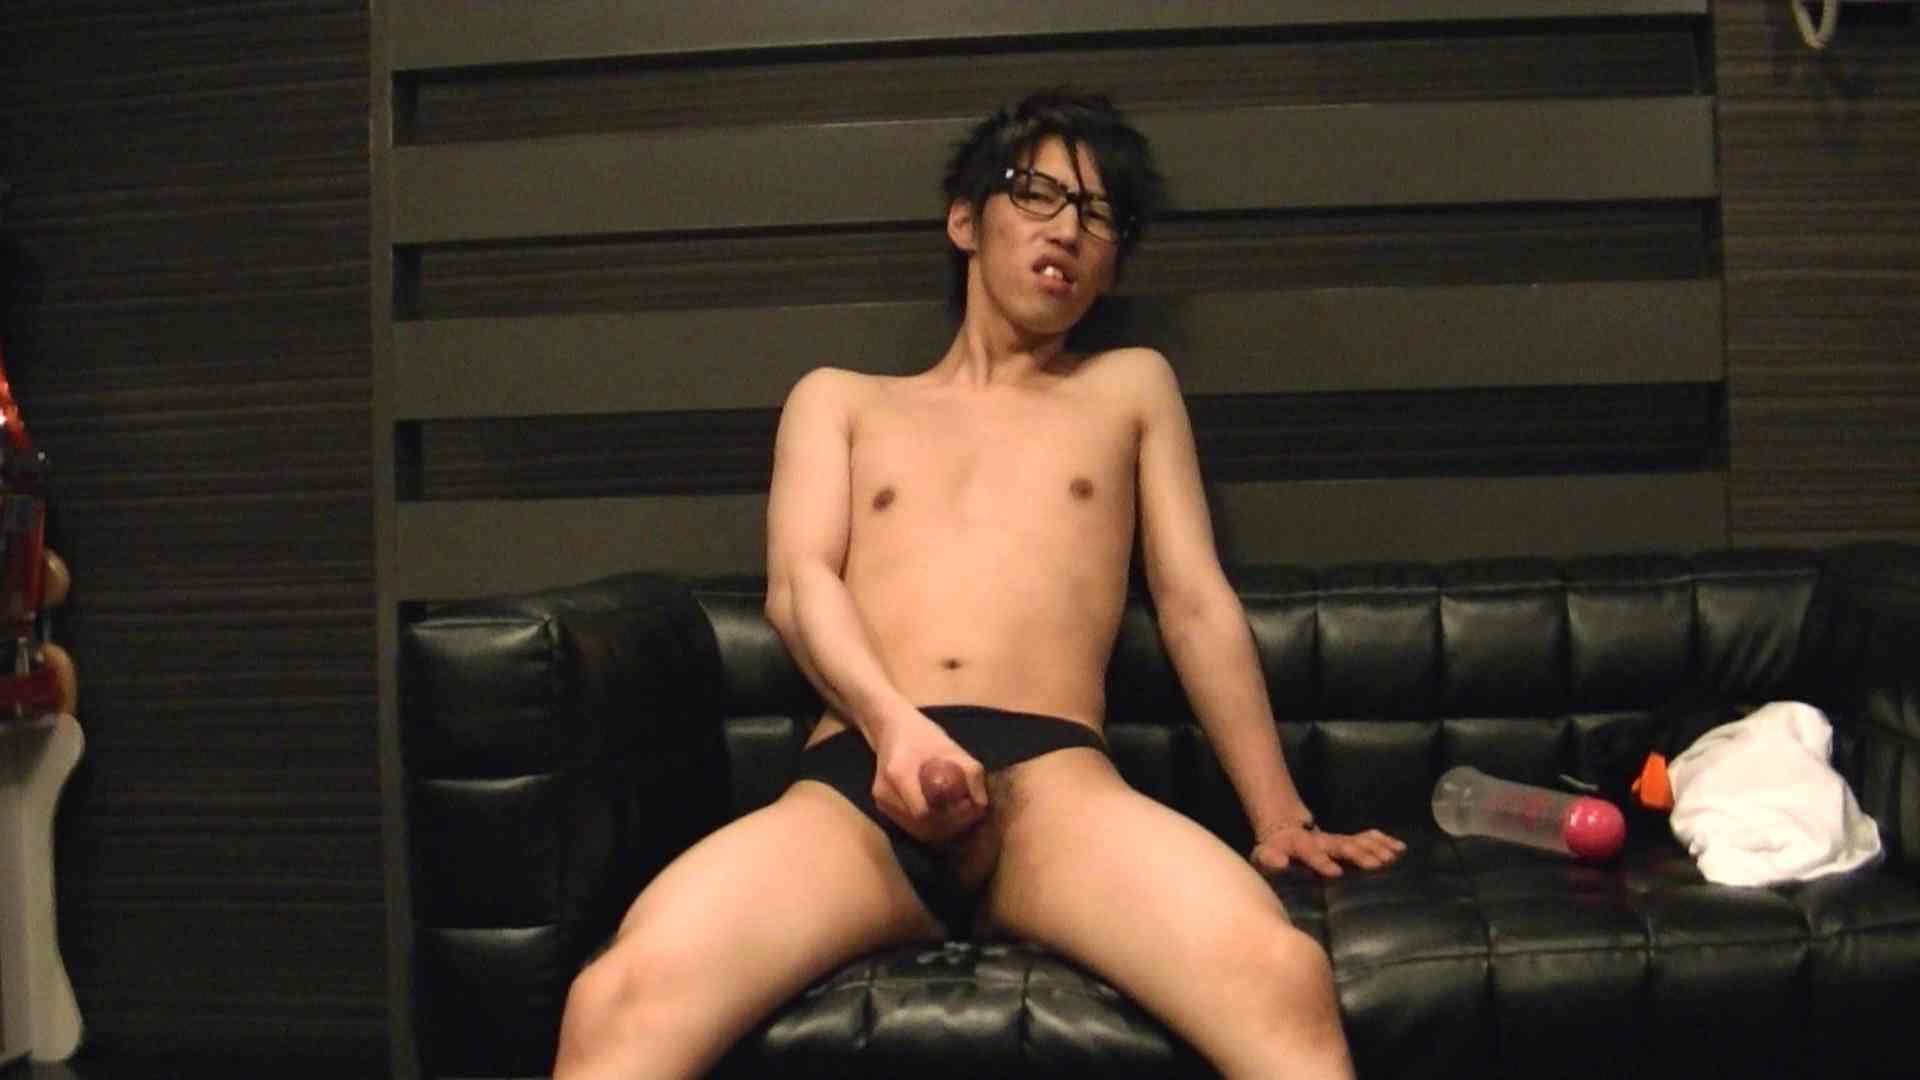 Mr.オナックスさん投稿!HD 貴方のオナニー三万円で撮影させてください。VOL.04 スリム美少年系ジャニ系 ゲイエロビデオ画像 55連発 13